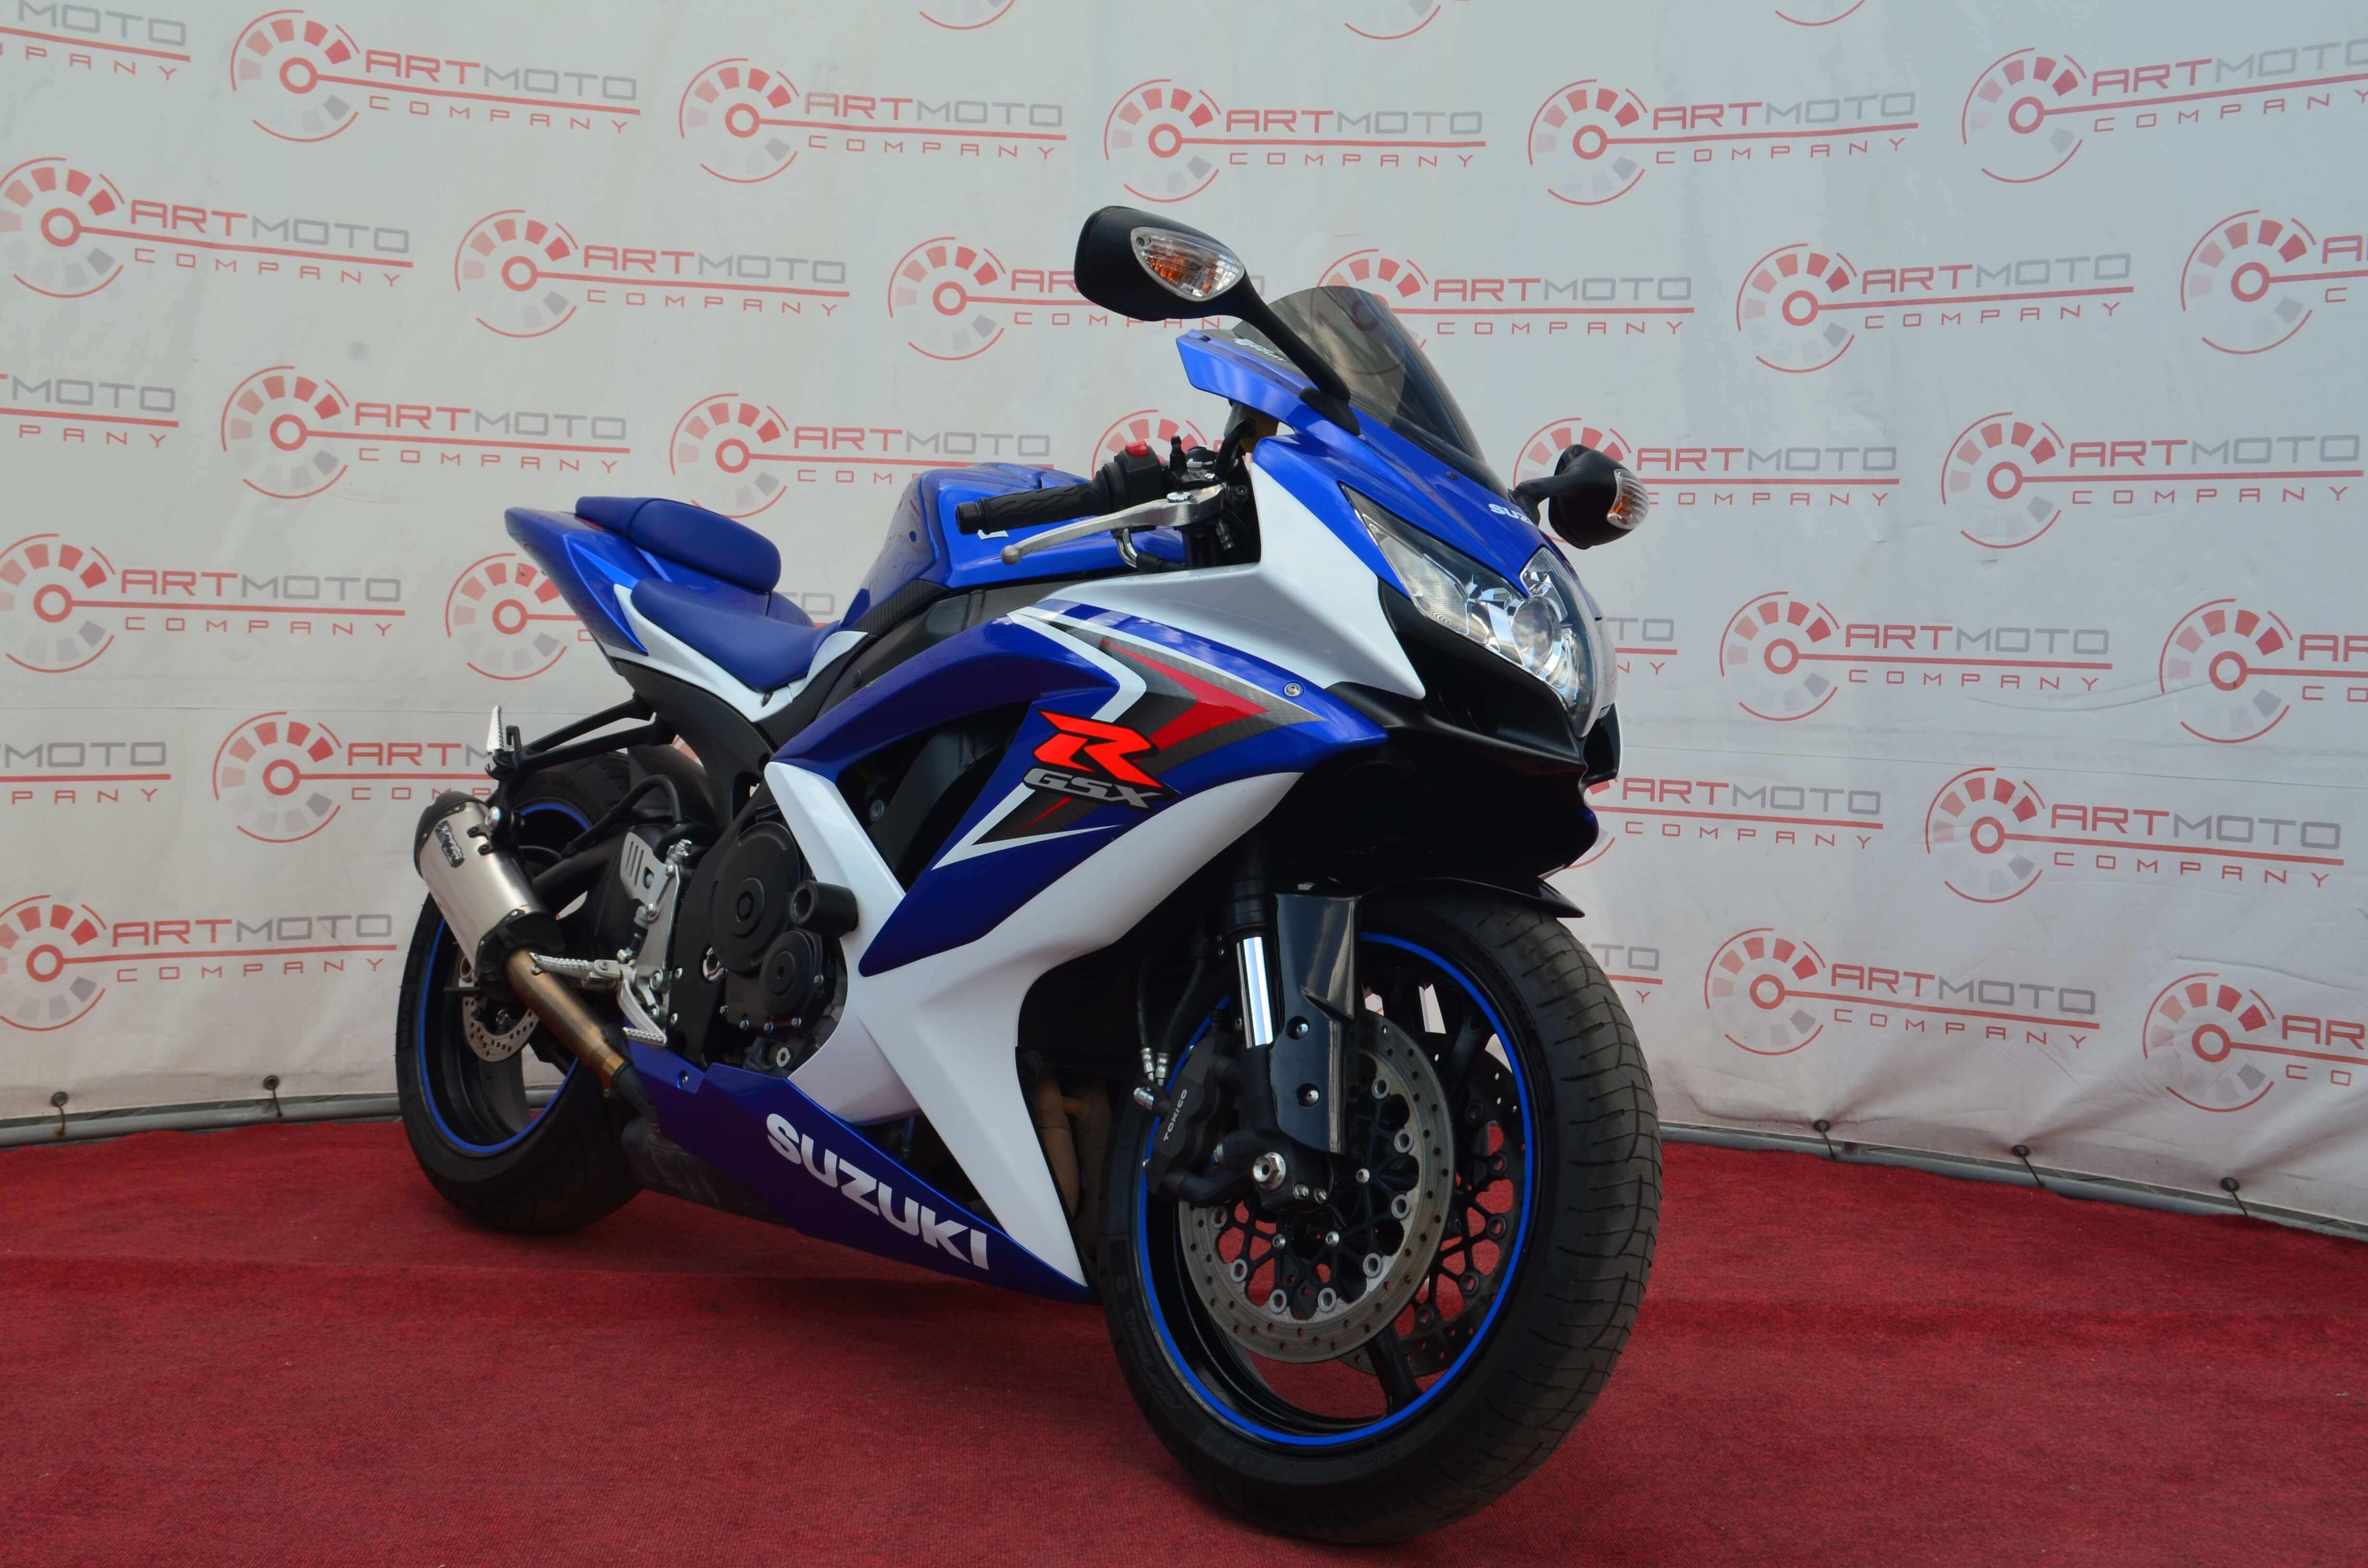 Мотоцикл Suzuki GSX-R 750  Артмото - купить квадроцикл в украине и харькове, мотоцикл, снегоход, скутер, мопед, электромобиль